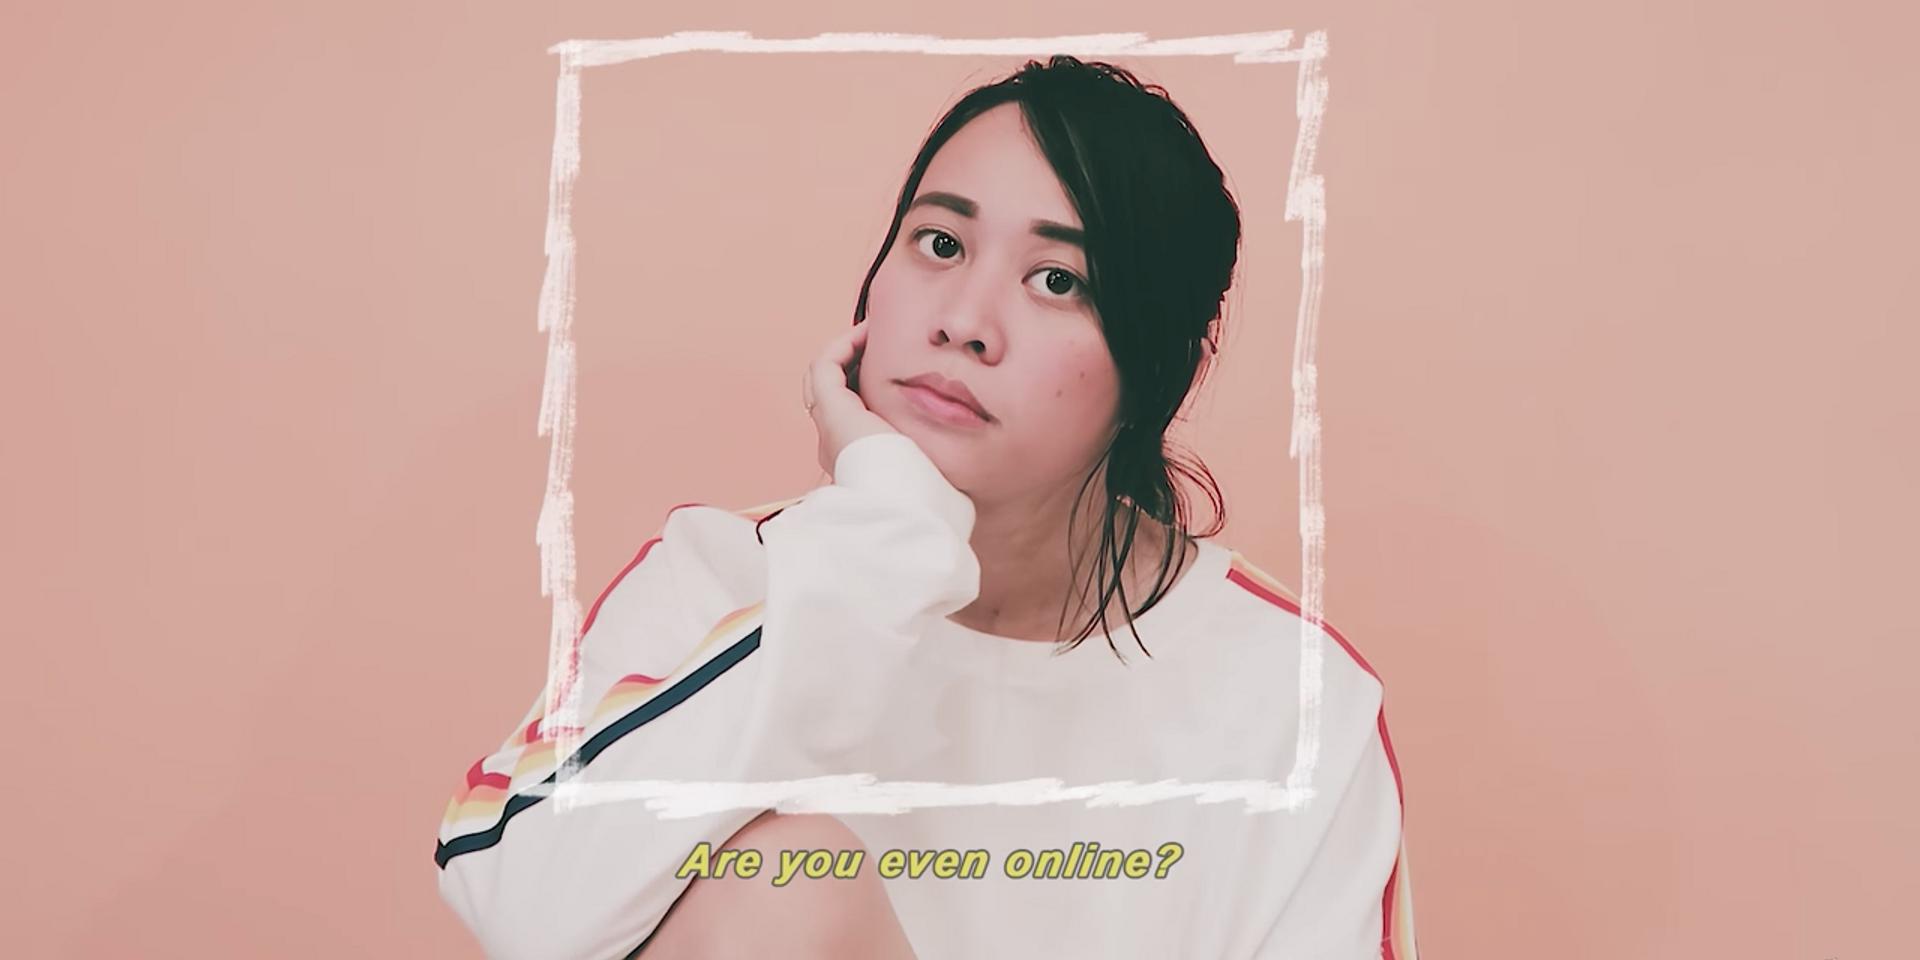 Reese Lansangan sings about the woes of digital love in 'Go Online' – watch